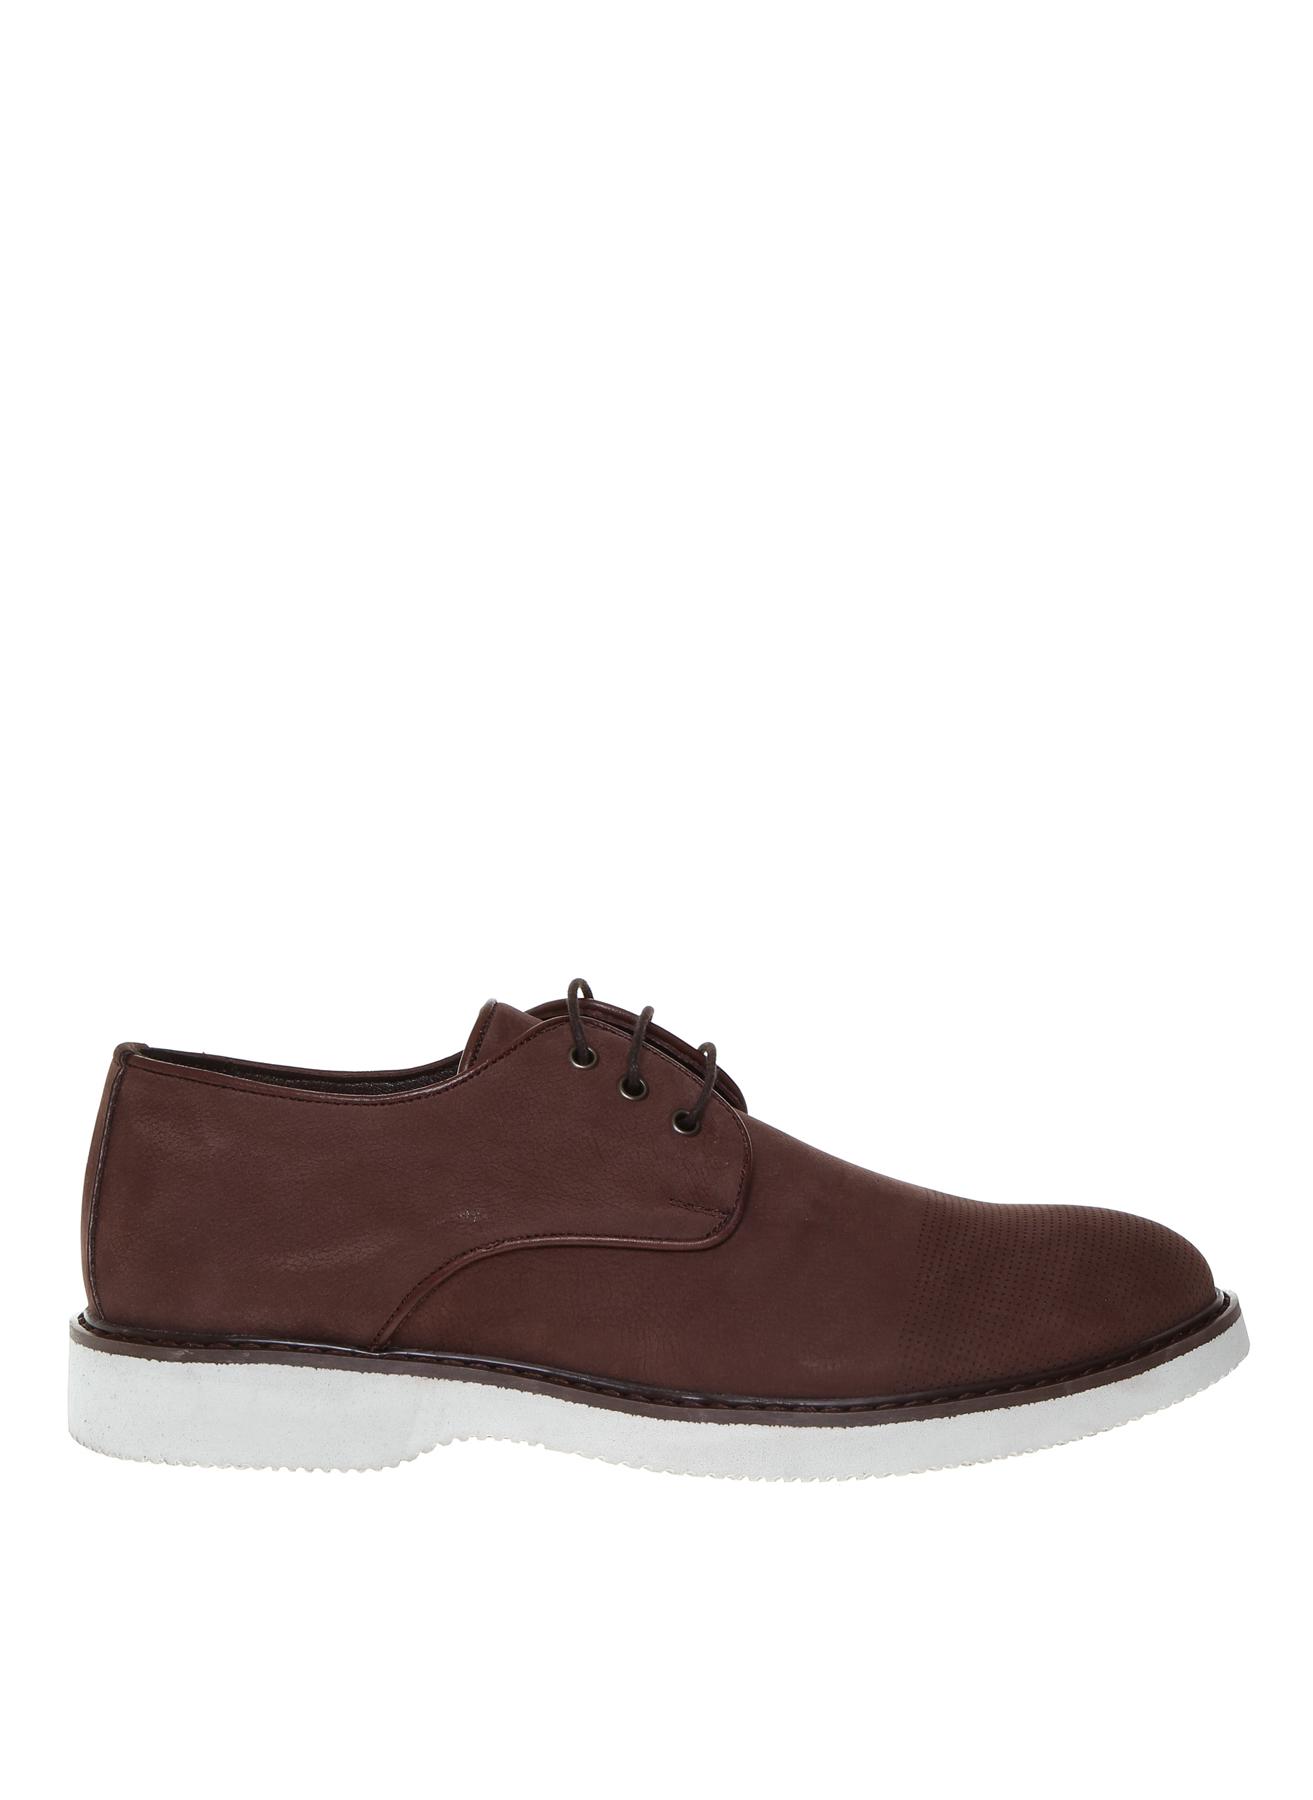 40 Kahve Fabrika Erkek Kahverengi Nubuk Klasik Ayakkabı 5001909948001 & Çanta